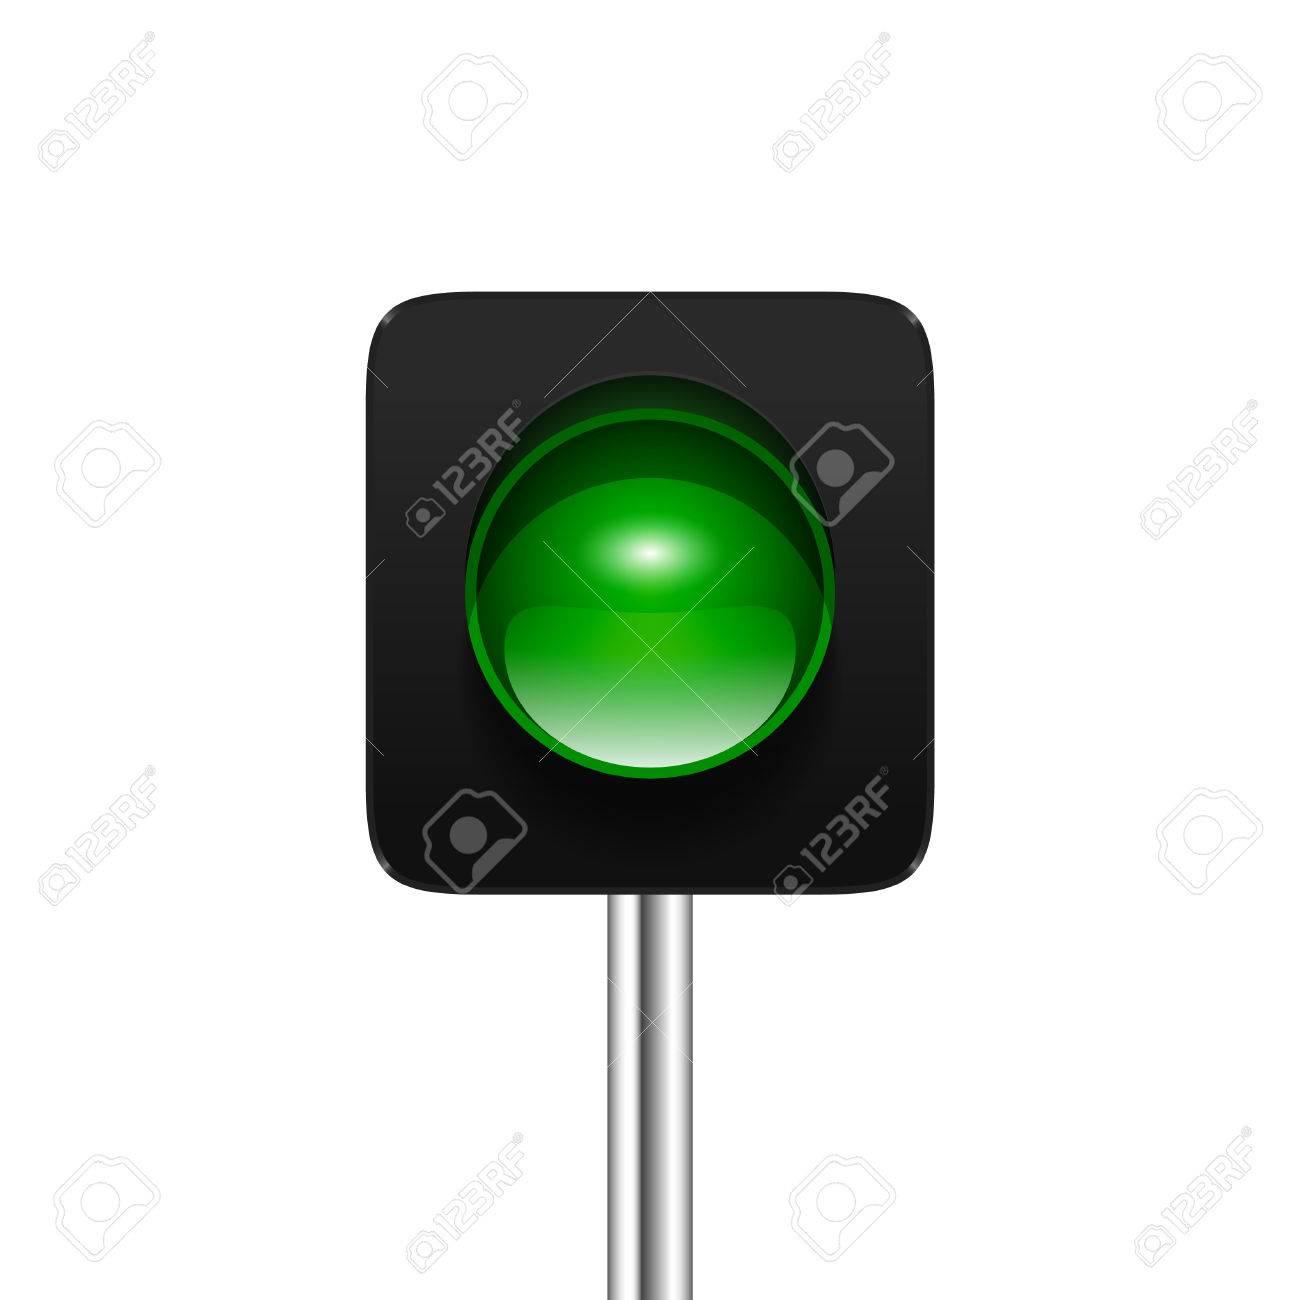 Stylish Modern Vector Green Single Aspect Traffic Signal Isolated ... for Traffic Light Green Icon  588gtk